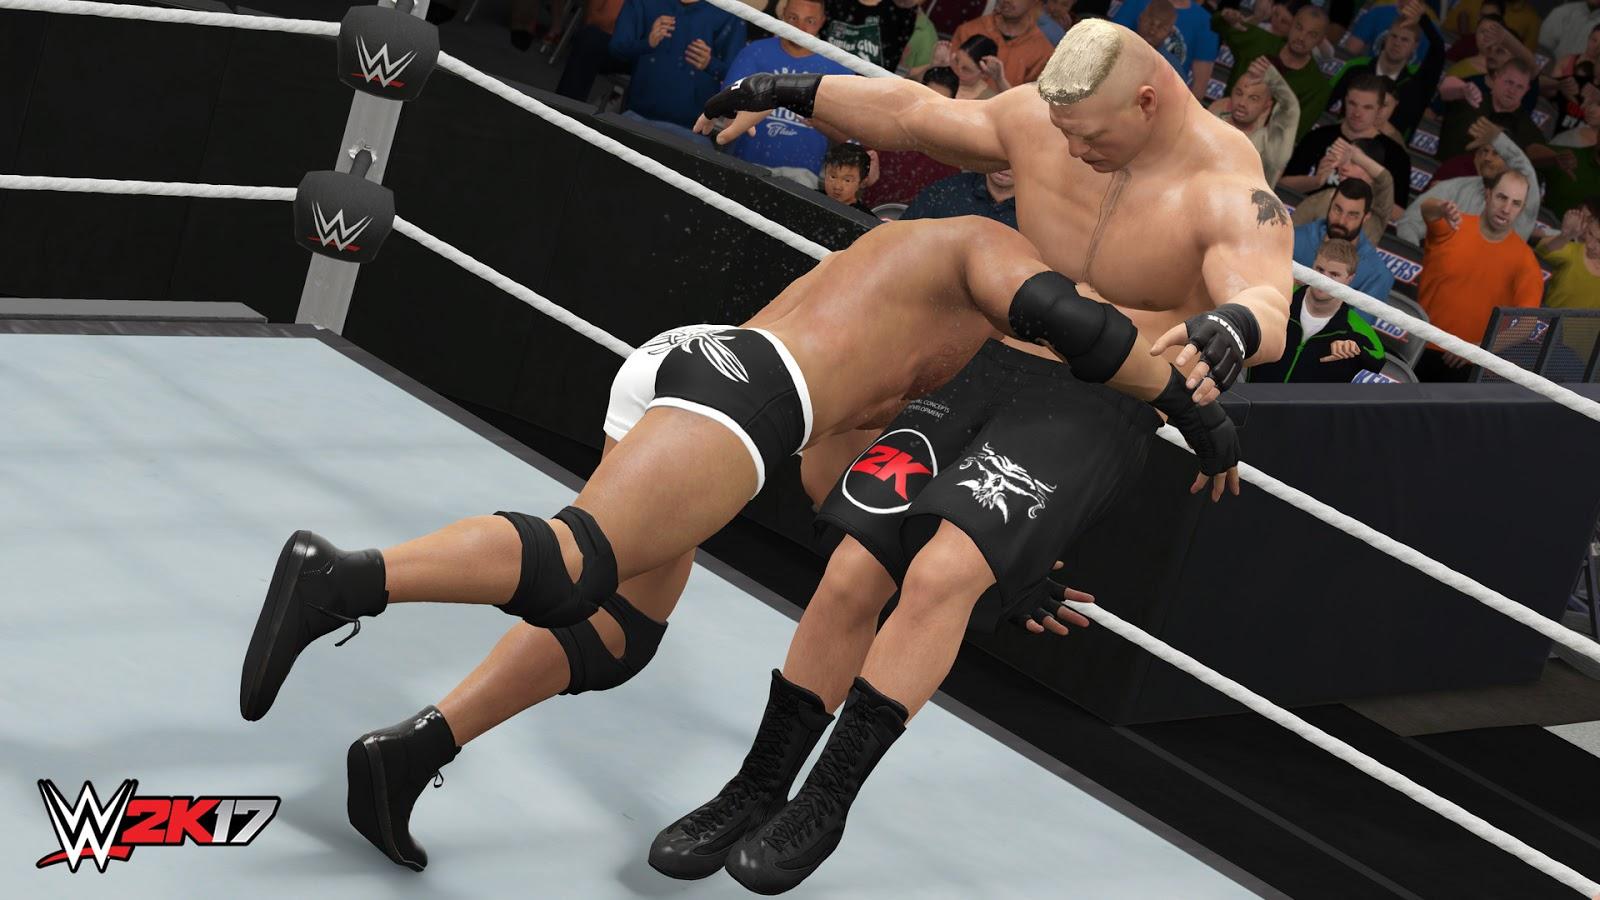 WWE 2K17 ESPAÑOL PC Descargar Full (CODEX) + REPACK 10 DVD5 (JPW) 9